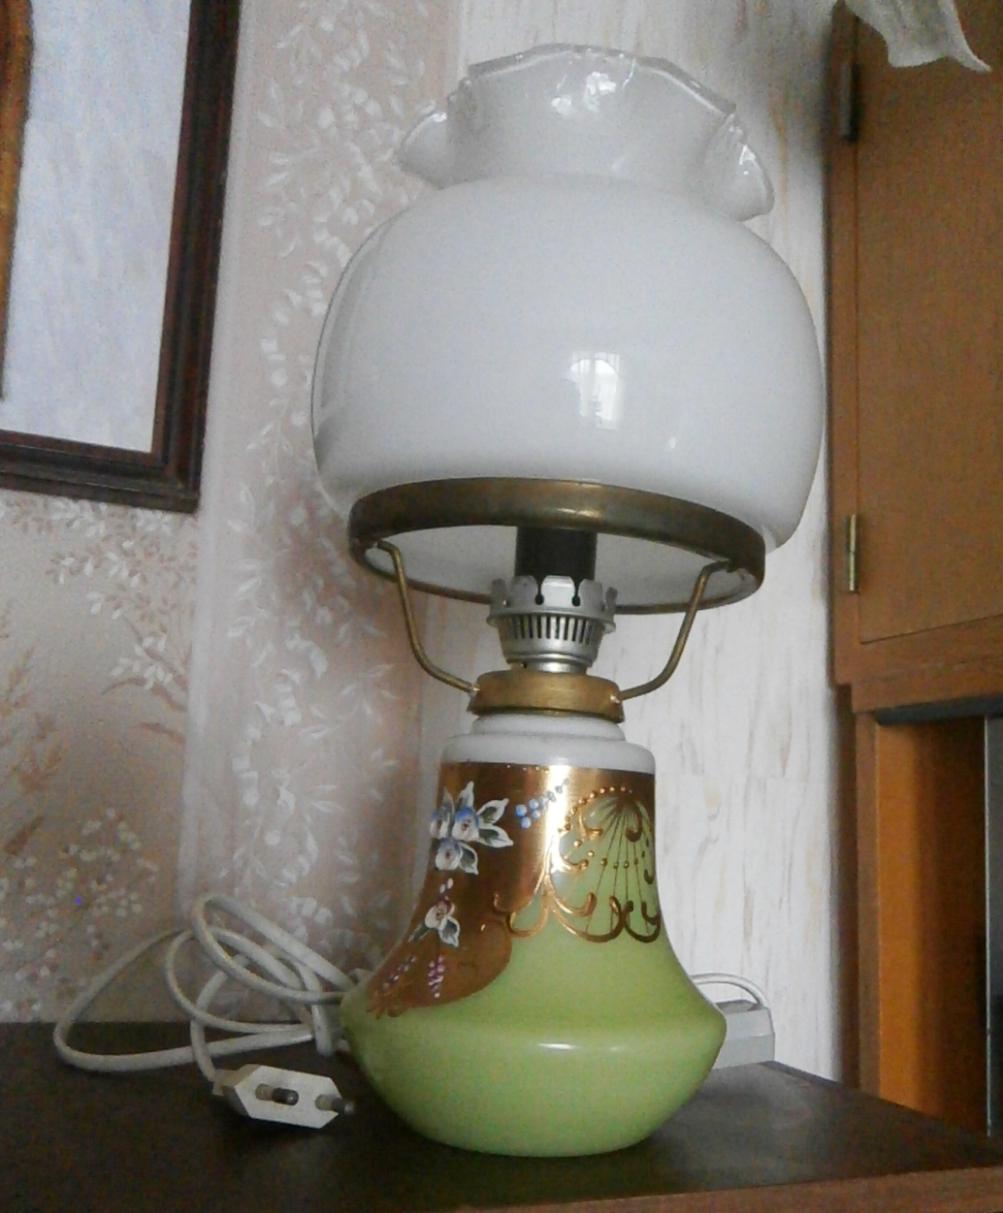 Retro lampa petrolejka - Obrázek č. 1